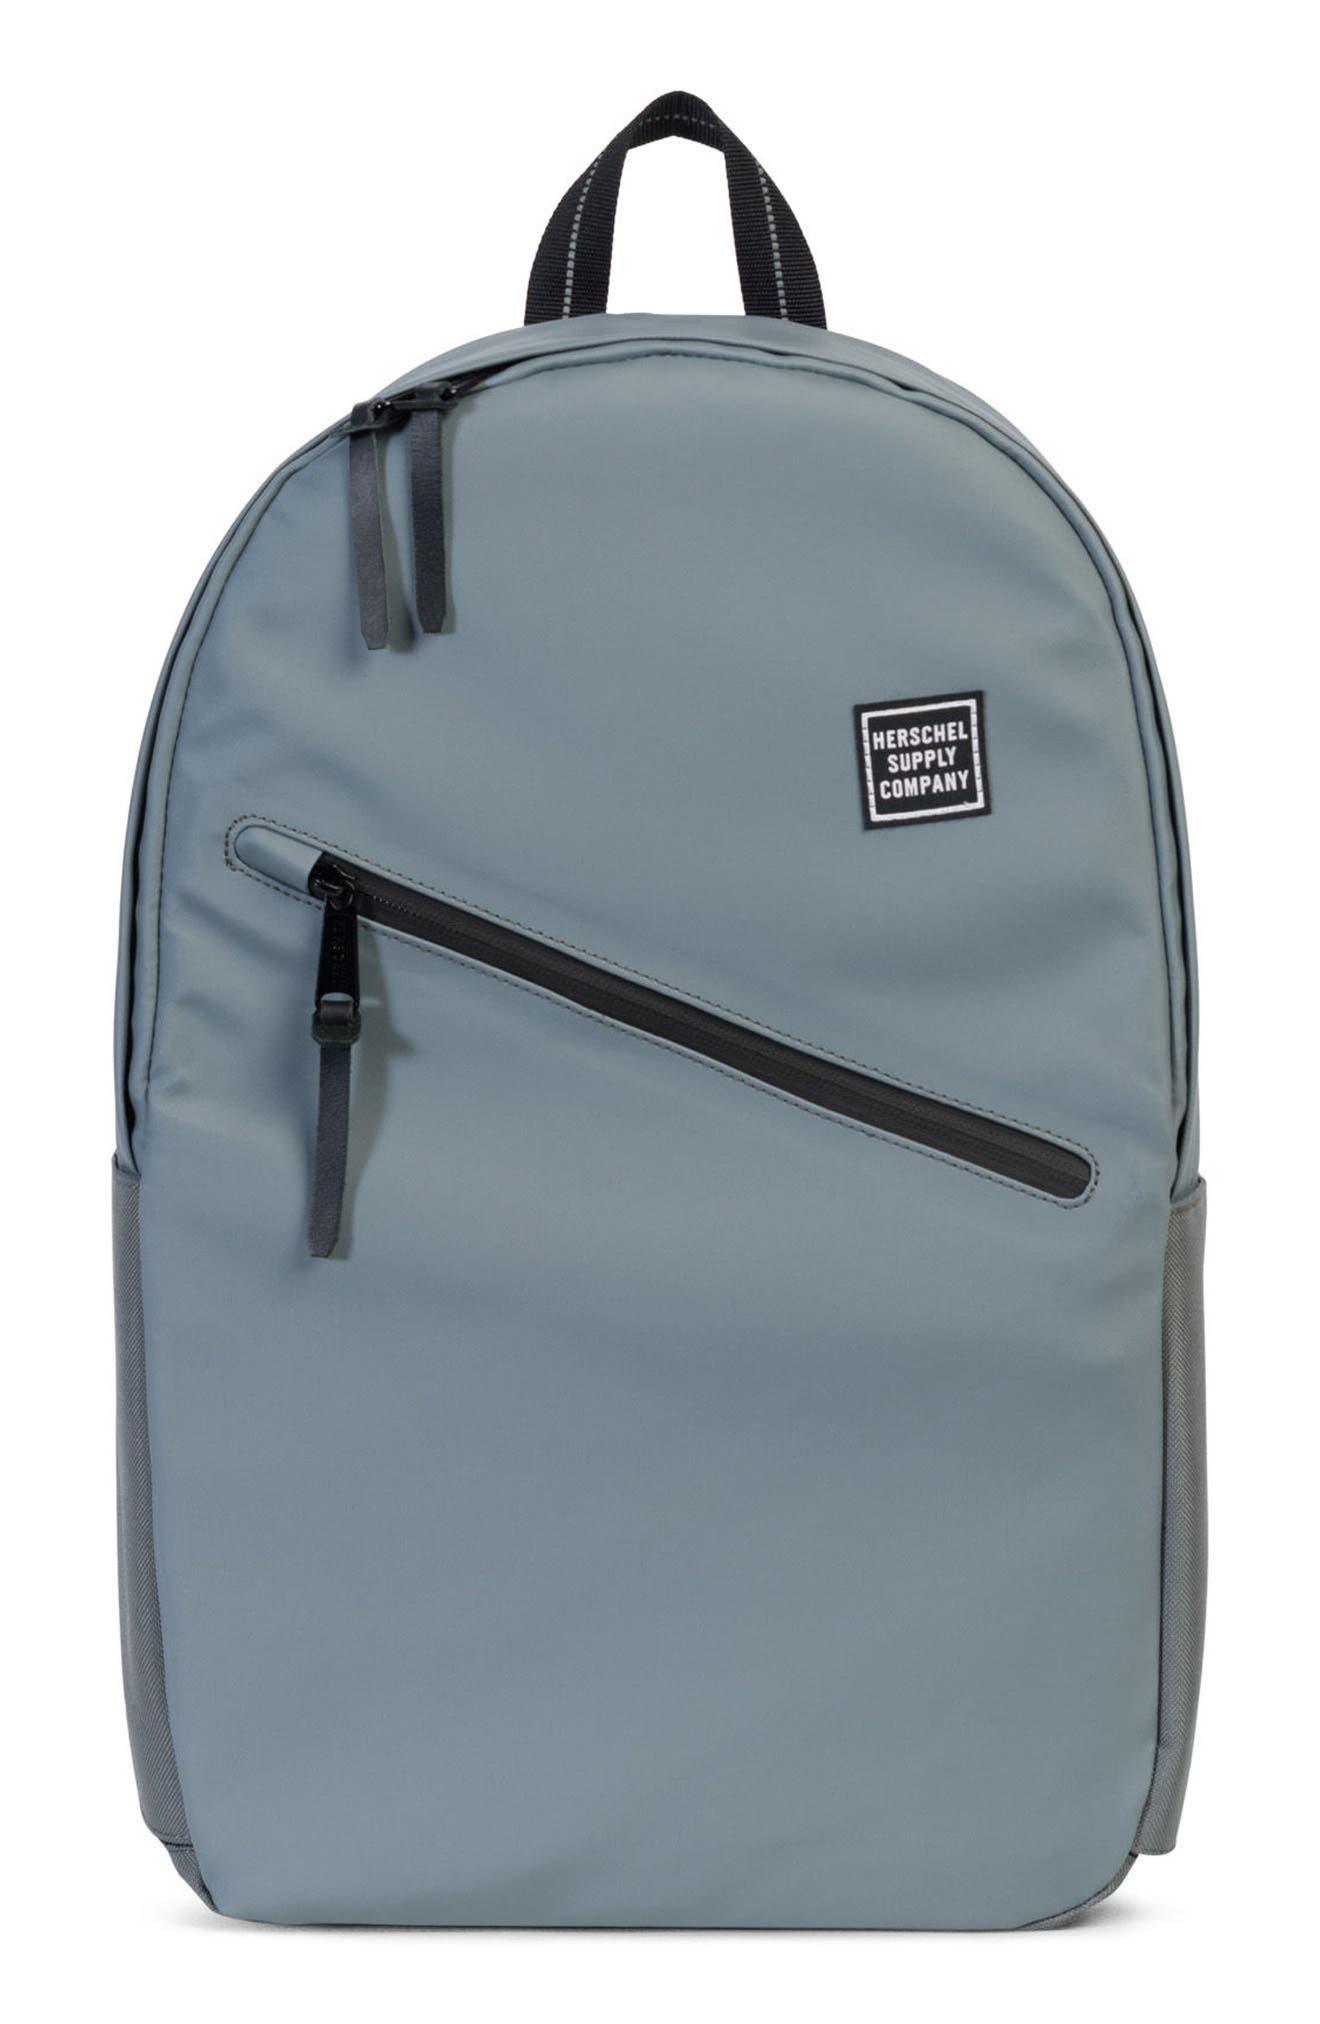 Main Image - Herschel Supply Co. Parker Studio Collection Backpack